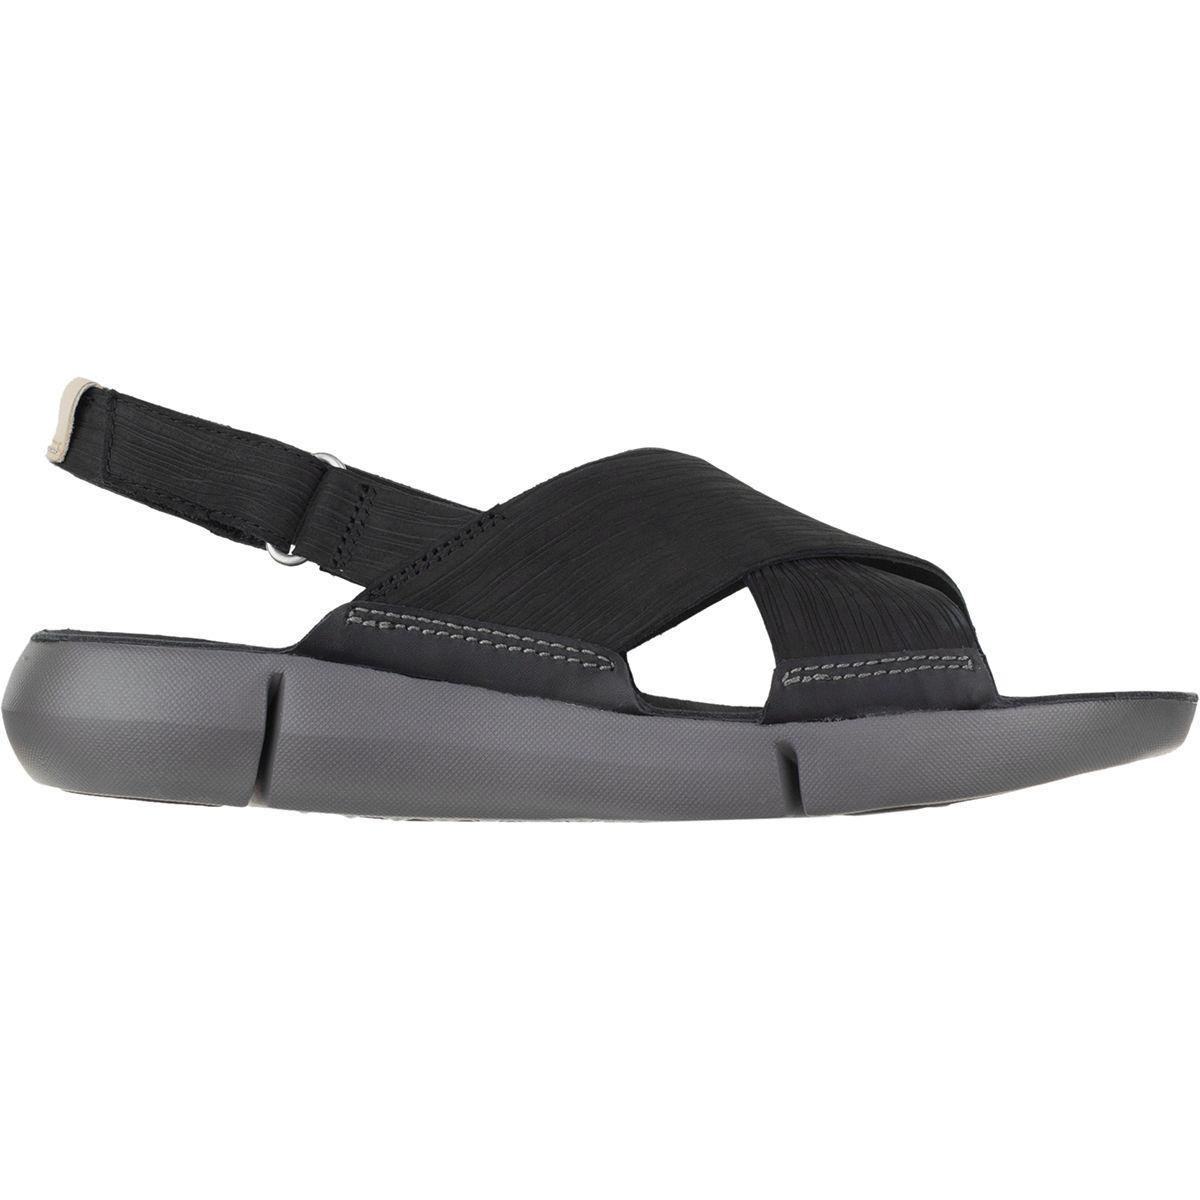 Clarks TRI CHLOE - Sandals - black FucbWKjB4K